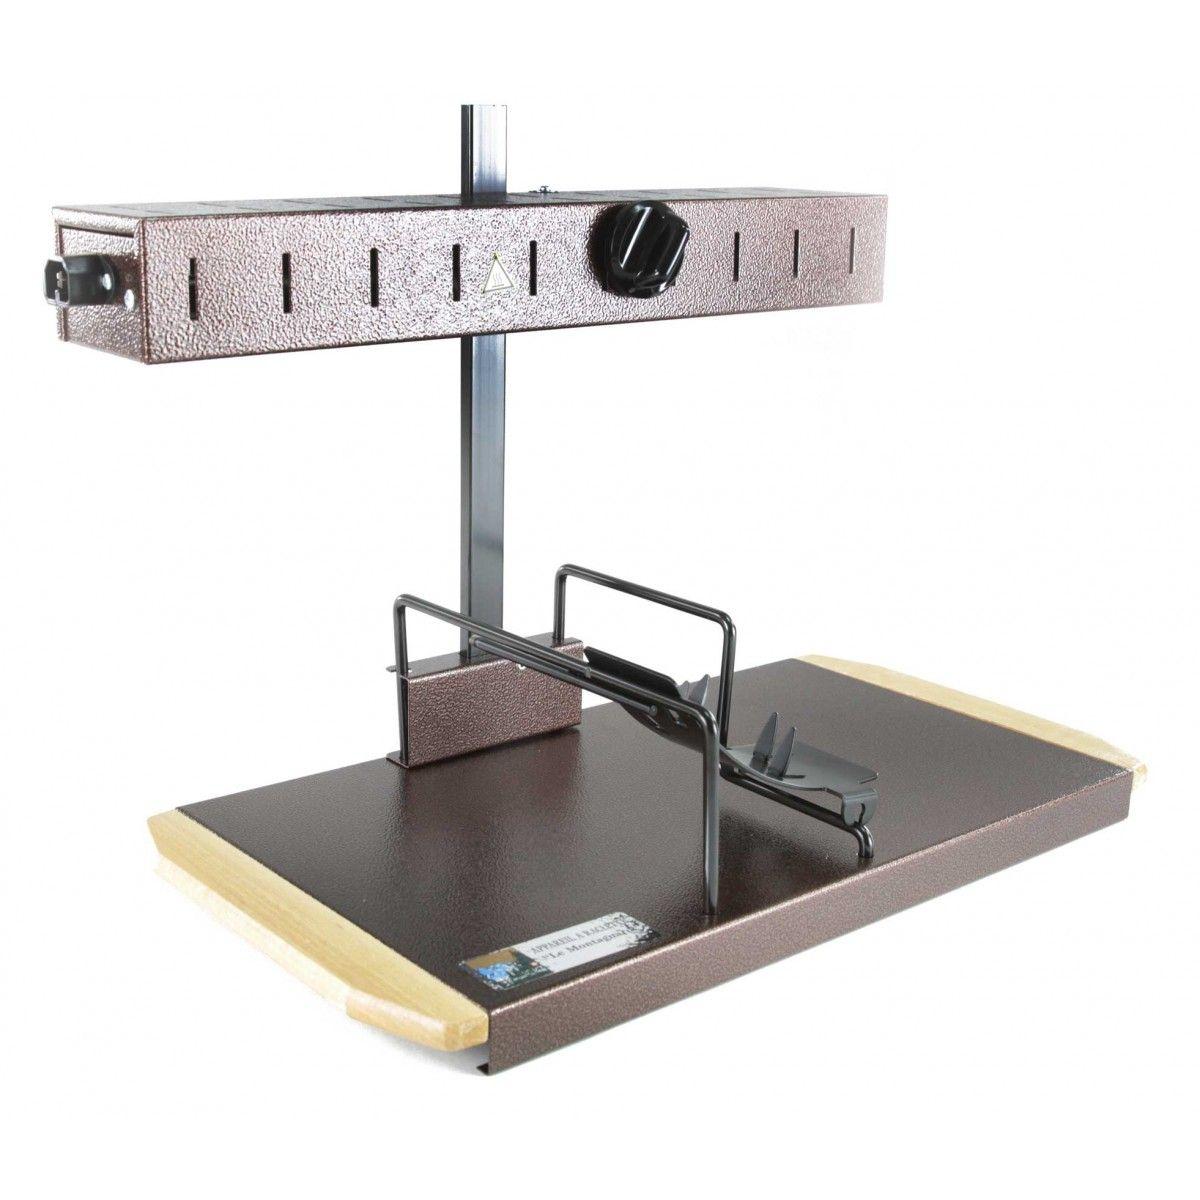 appareil raclette 1 2 meule bron coucke auberge appareil a raclette pinterest. Black Bedroom Furniture Sets. Home Design Ideas